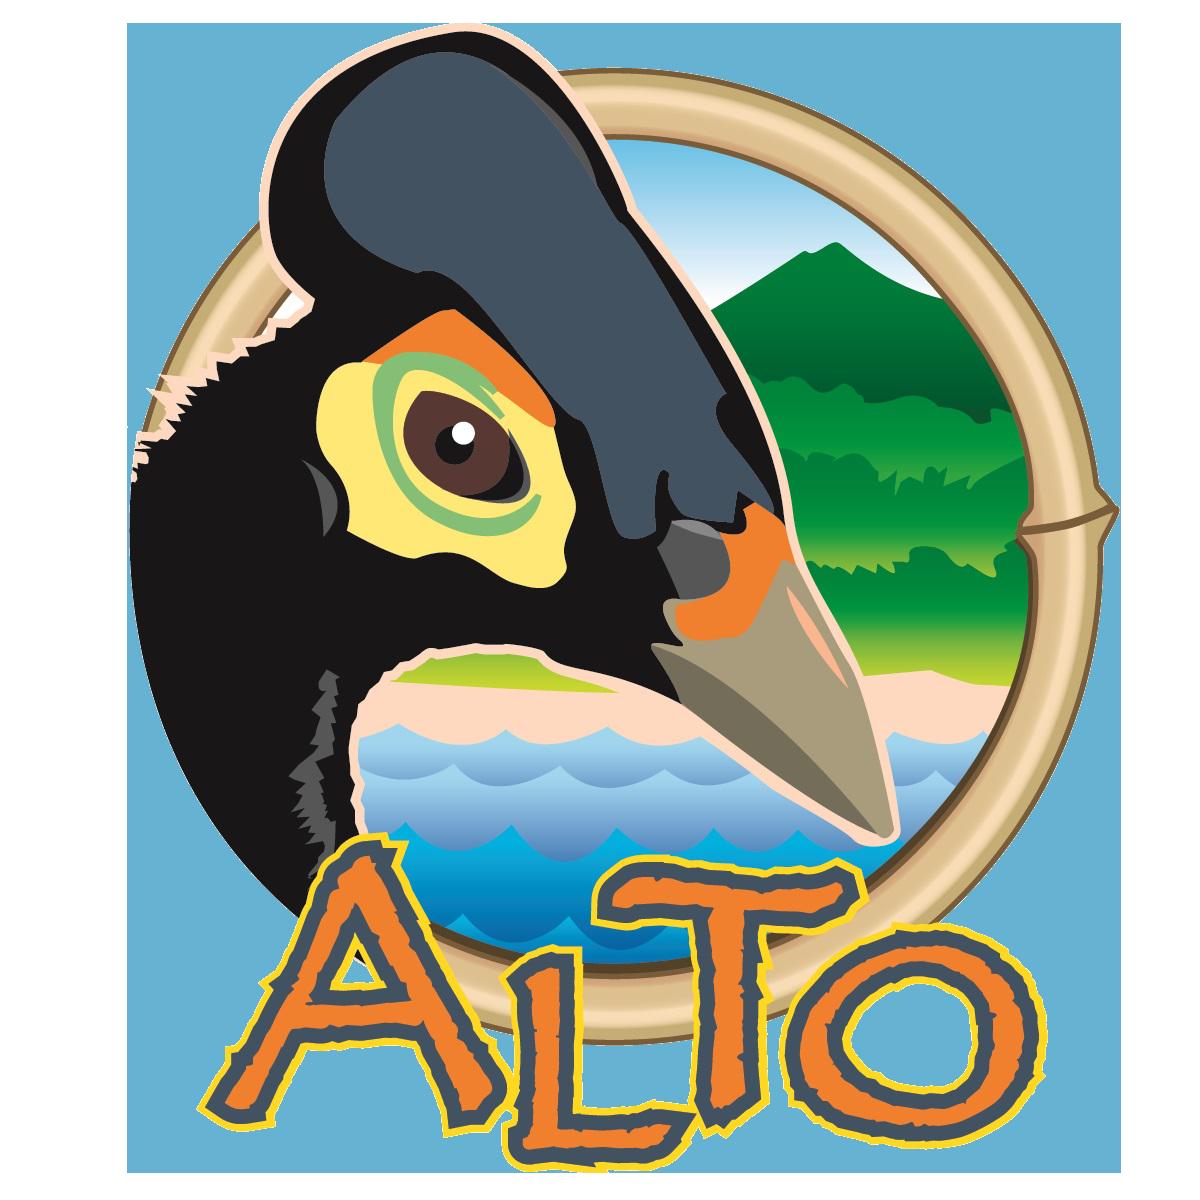 Alliance for Tompotika Conservation Logo